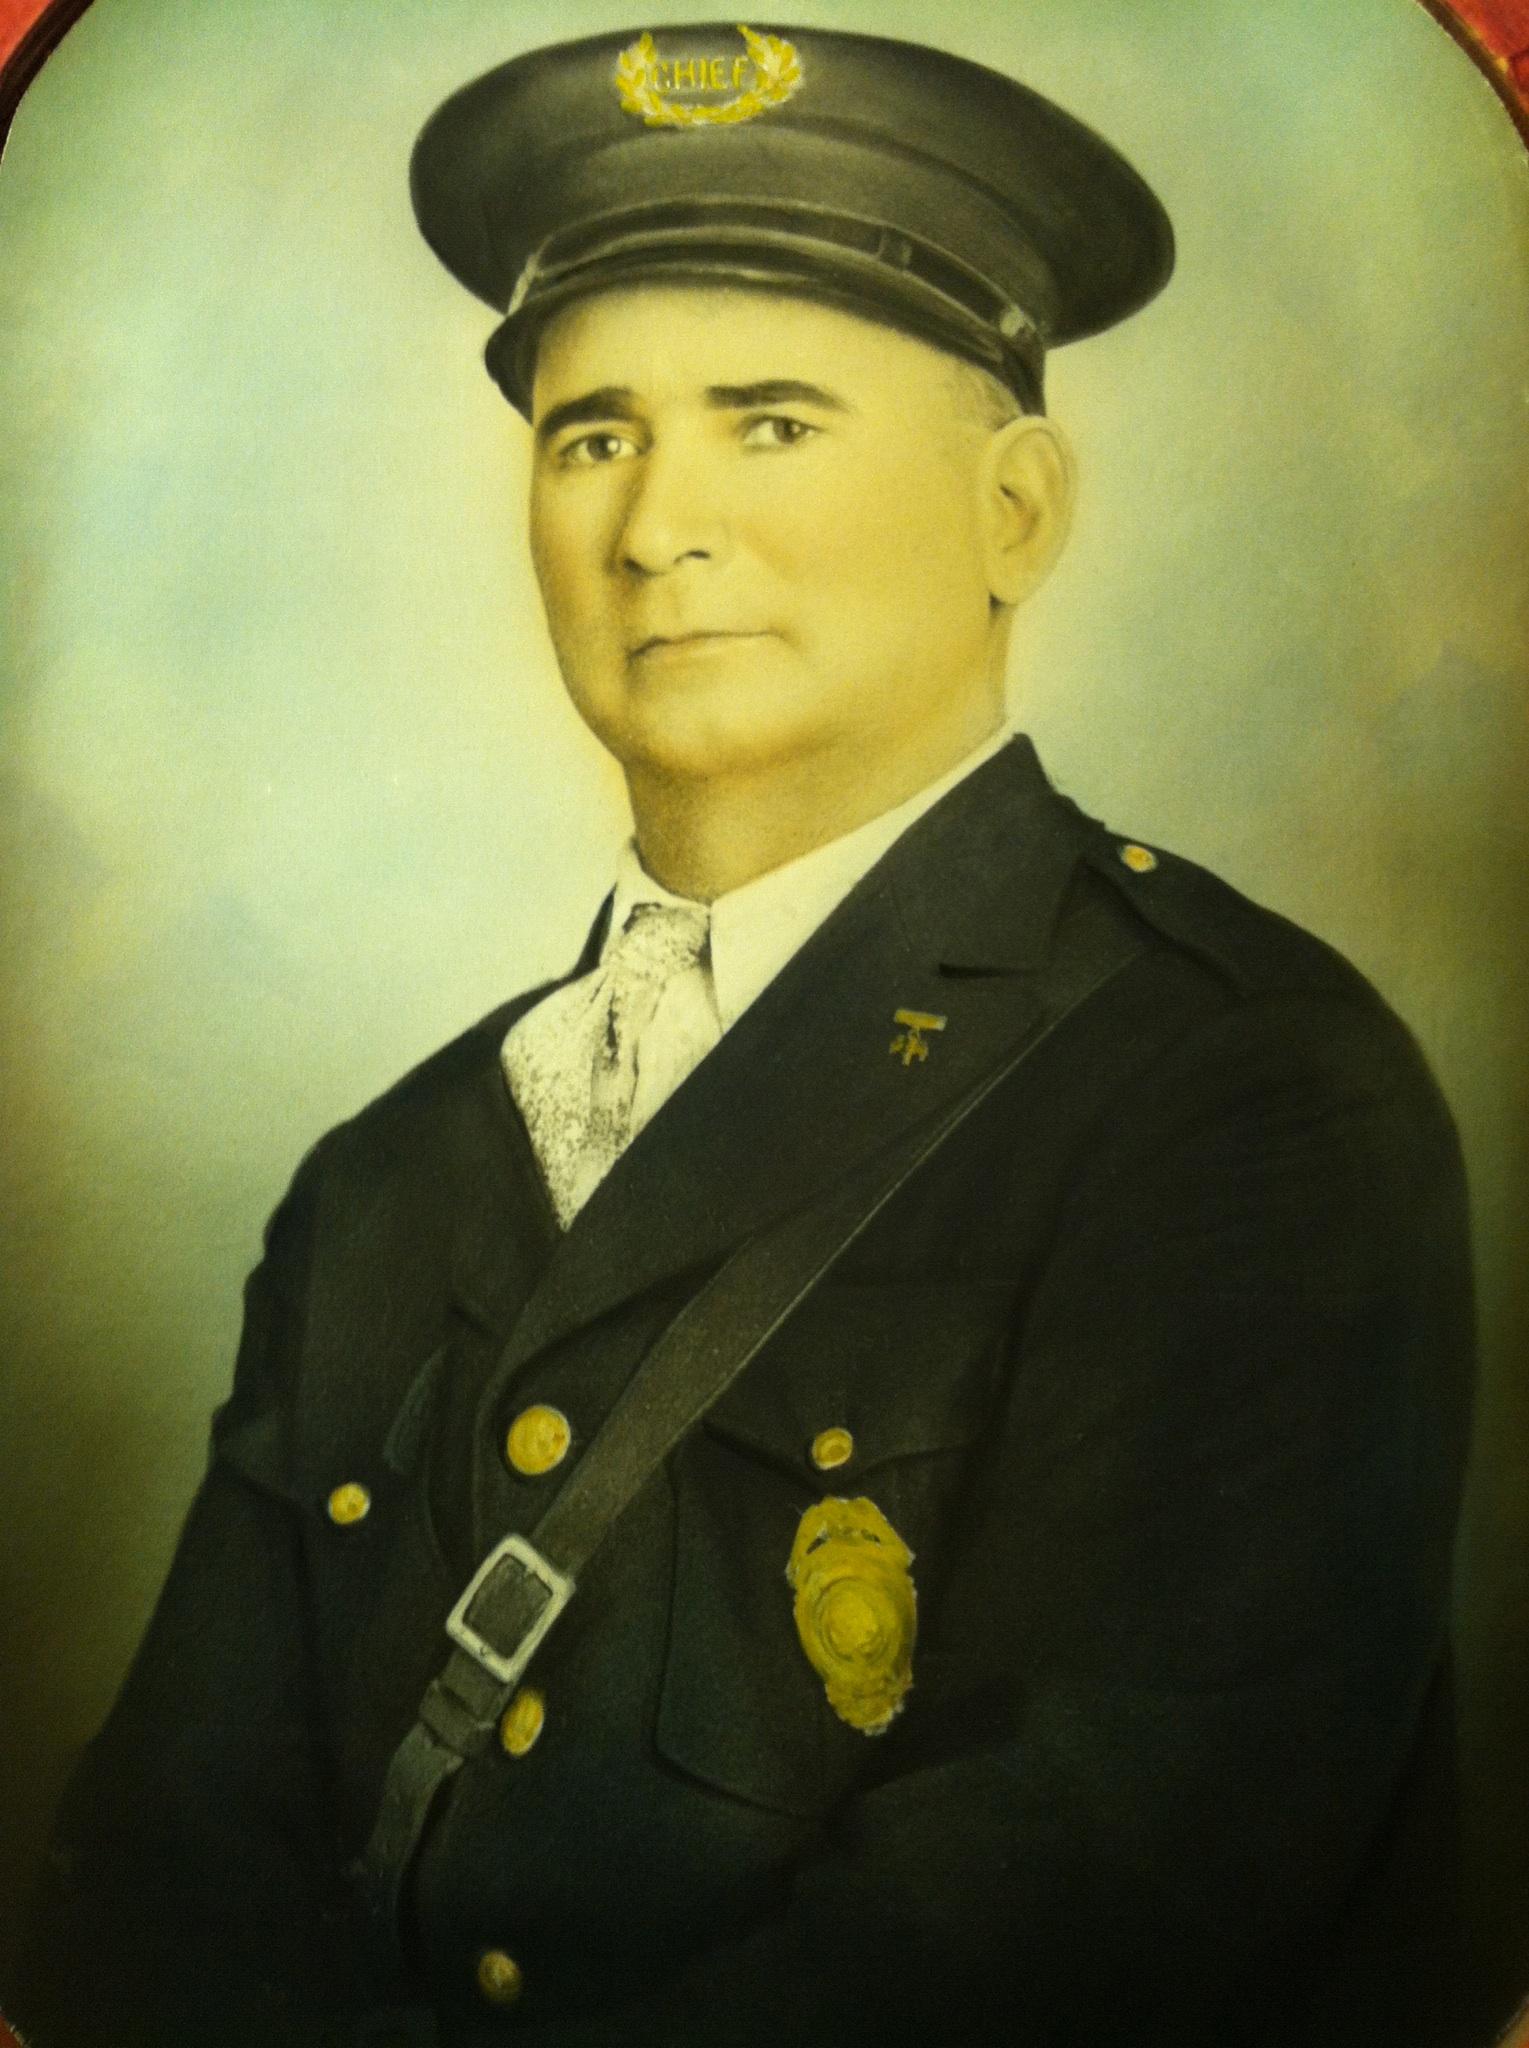 City Marshal Apolonio Pino   Santa Fe Police Department, New Mexico